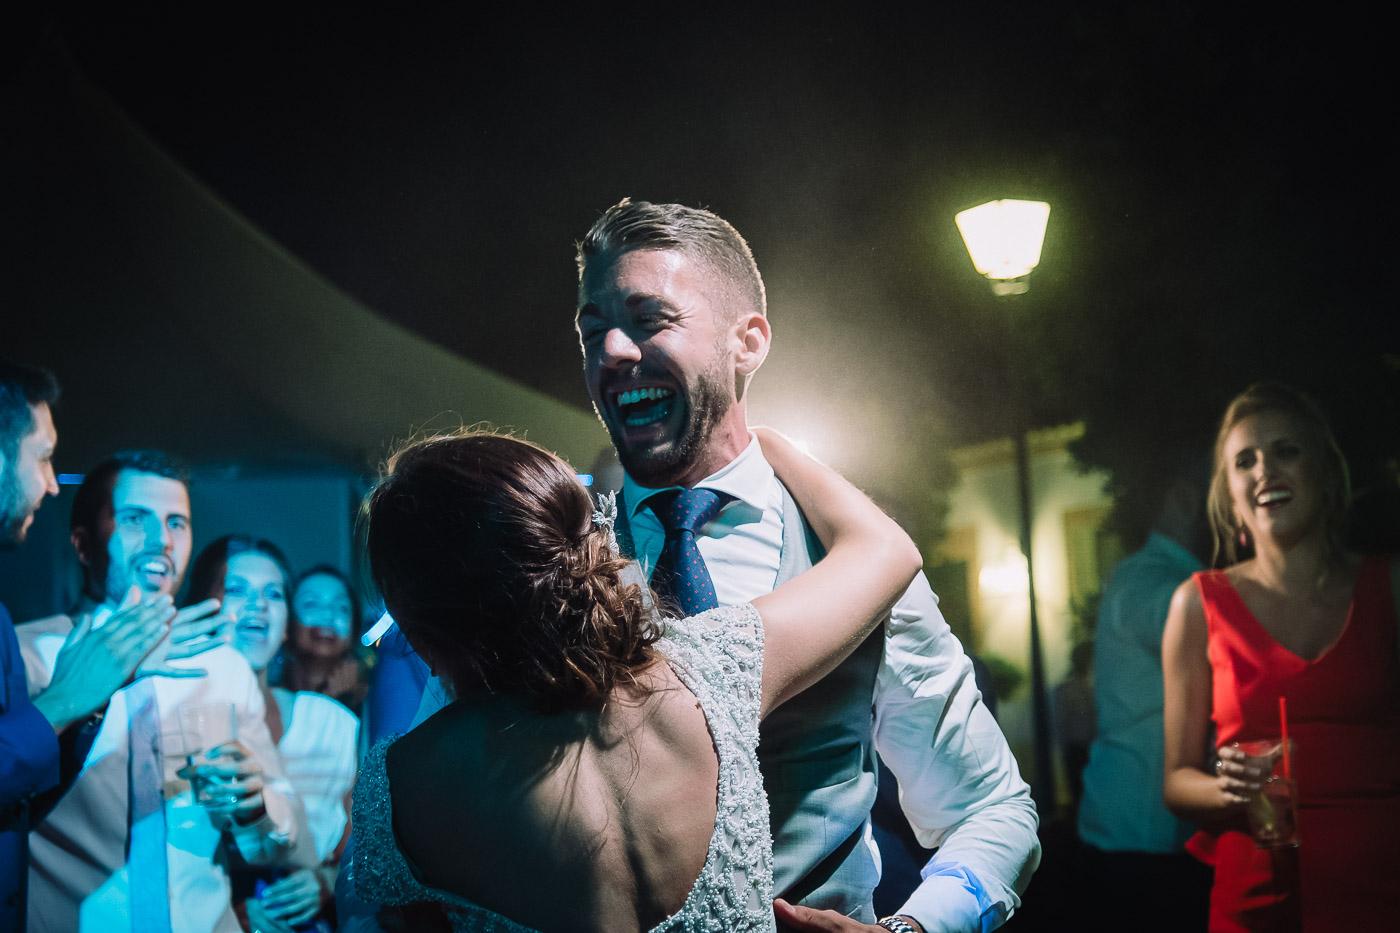 fotografo-bodas-sevilla-boda-santa-maria-sargenta-manuel-fijo